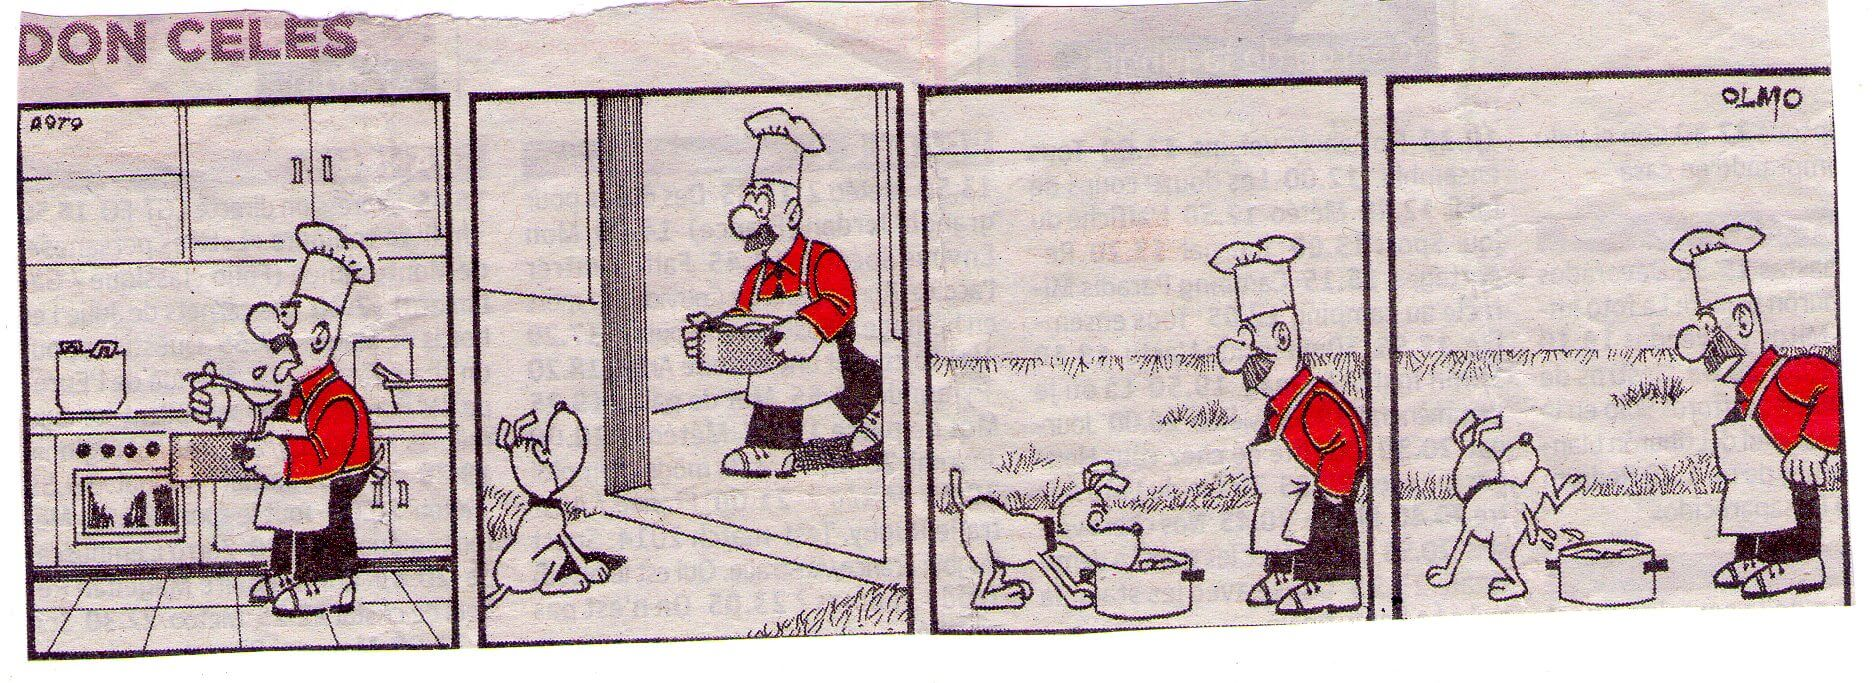 Don Celes cocinero